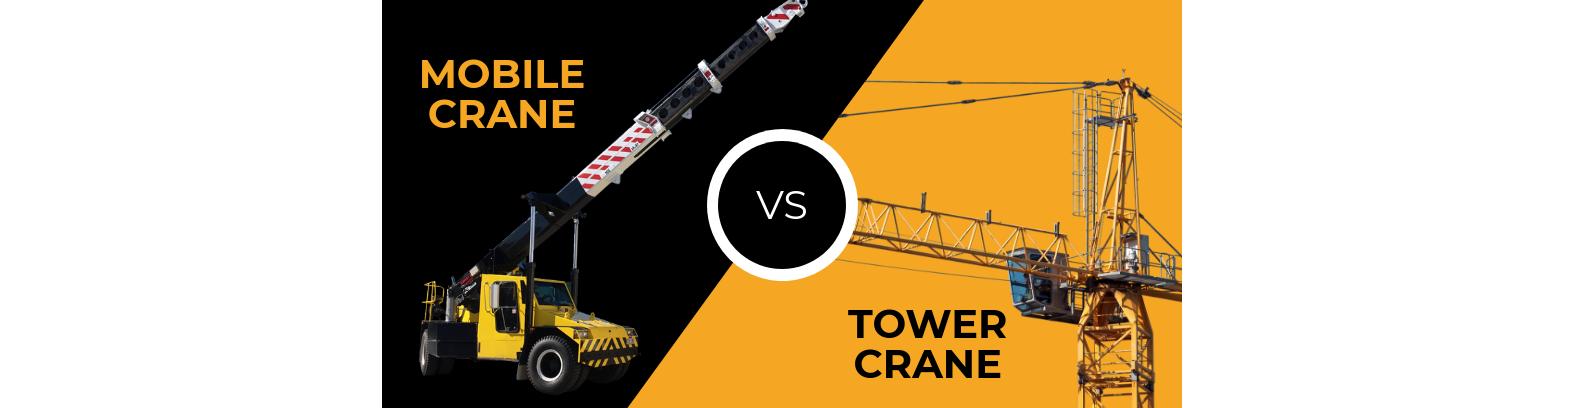 Mobile Crane Or Tower Crane?